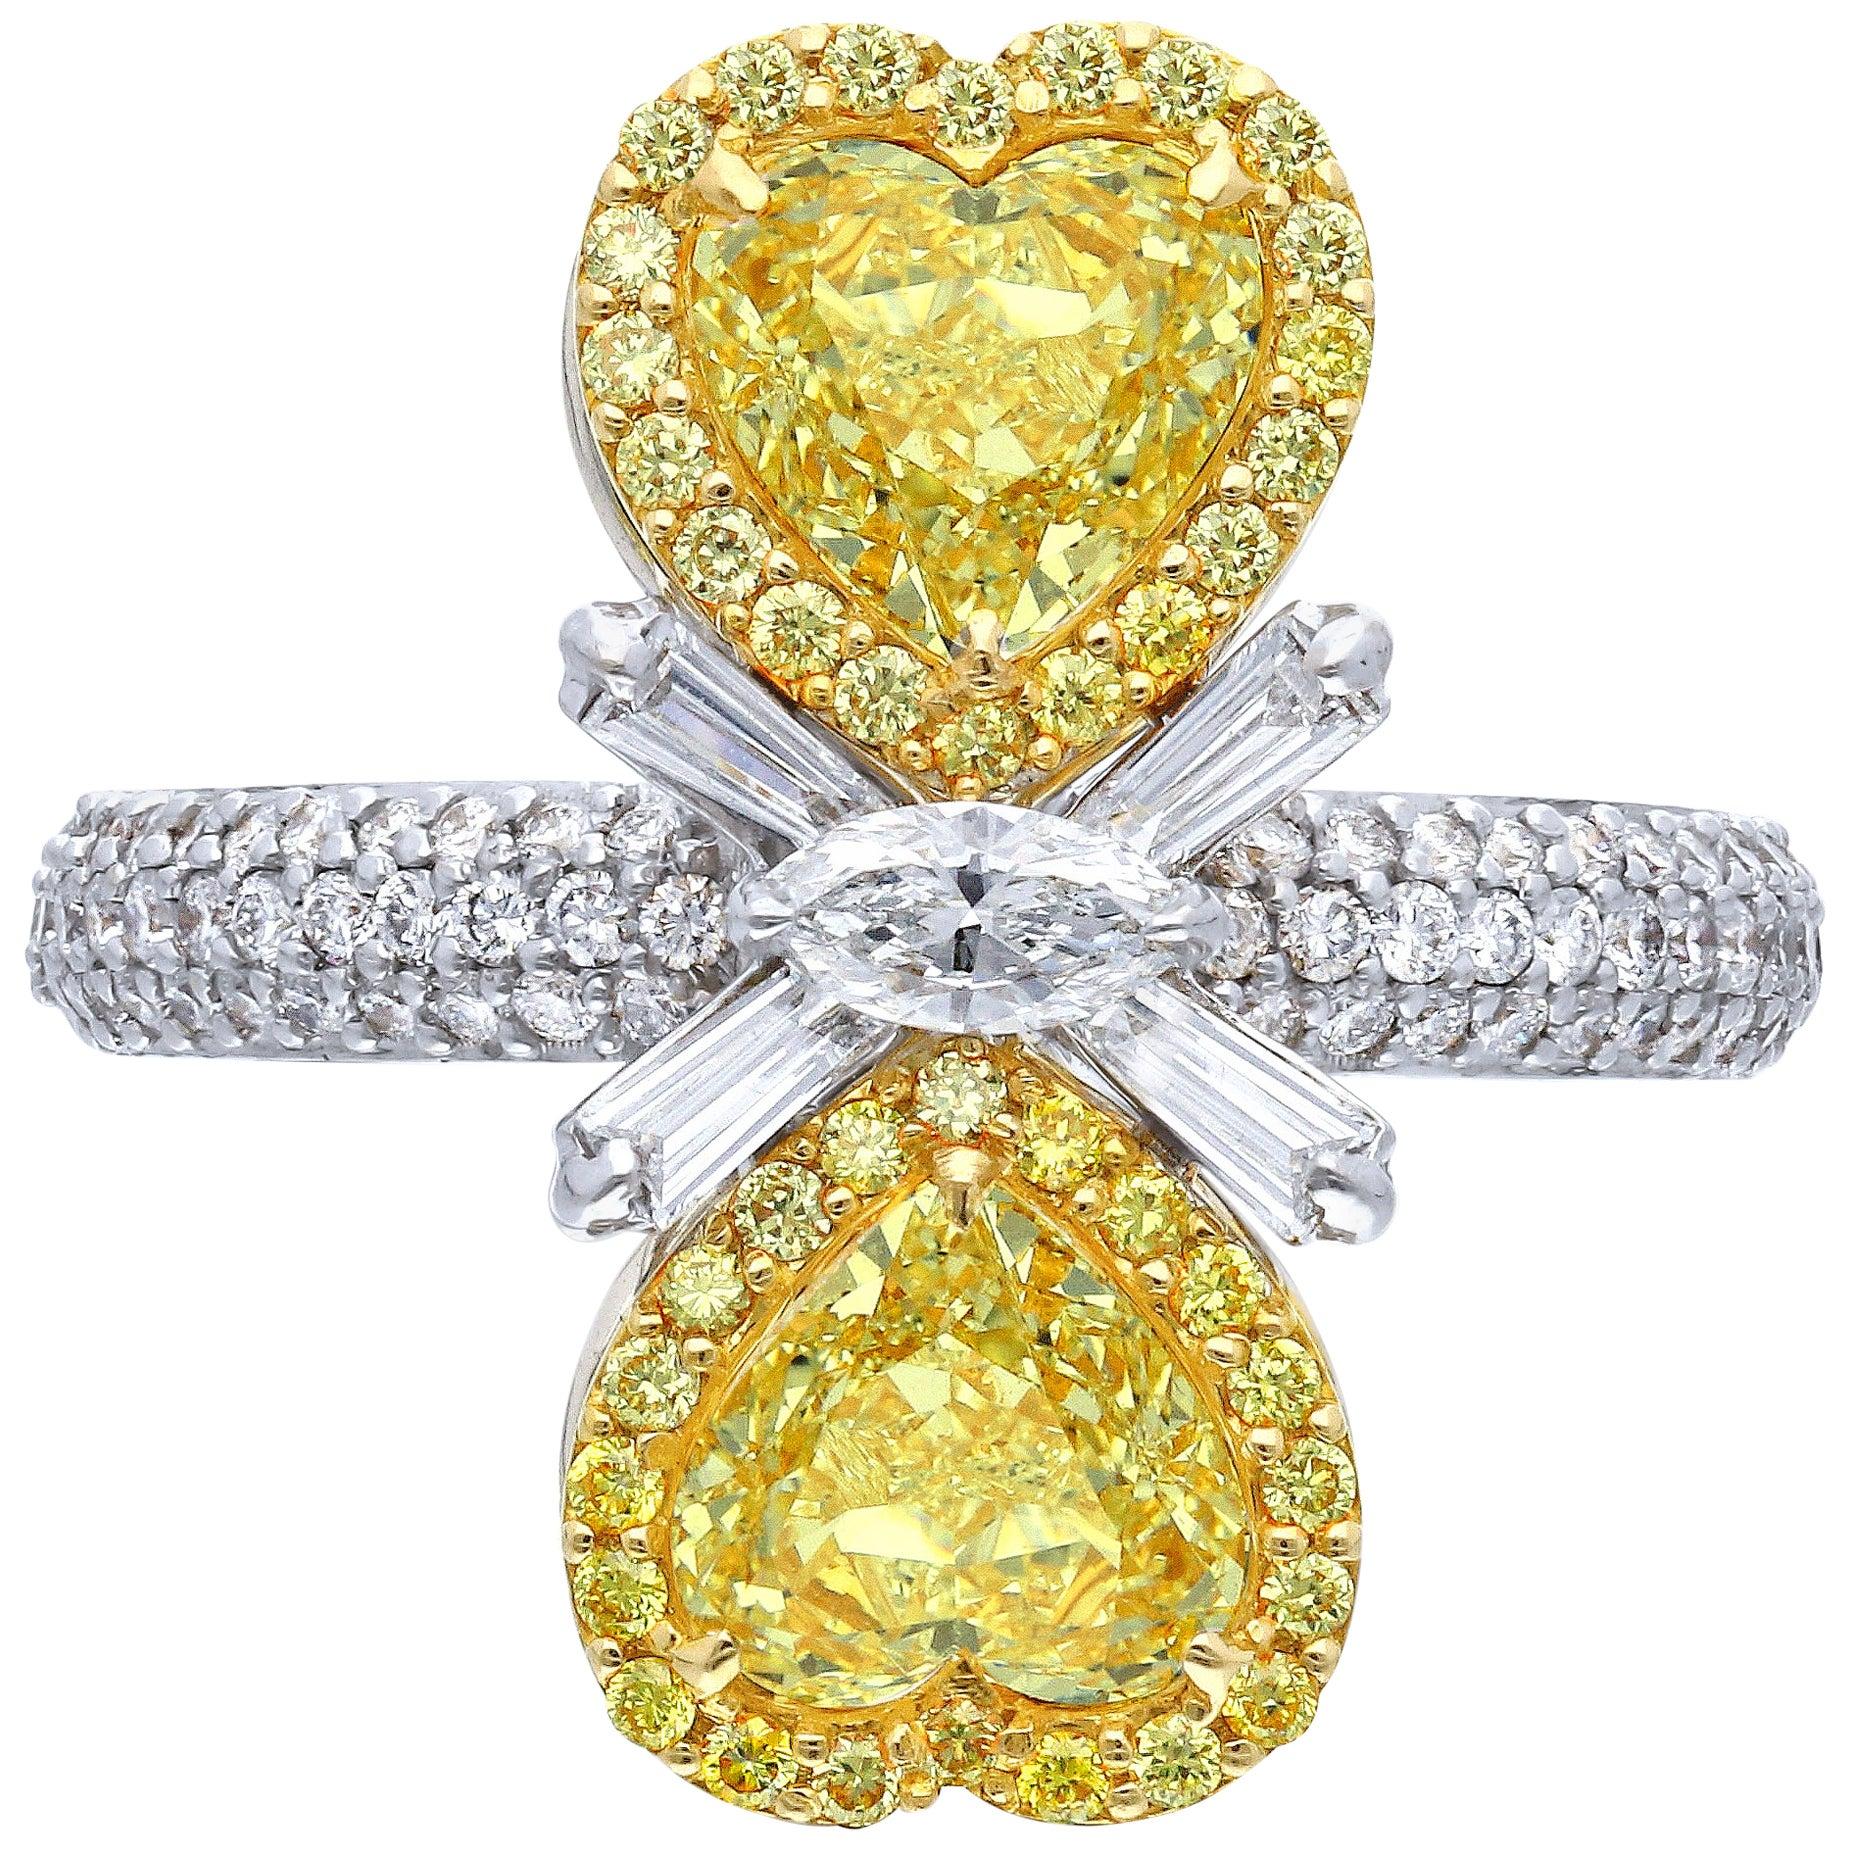 Twin Mirror Heart Canary Yellow Diamond Ring, 2.91 Carat